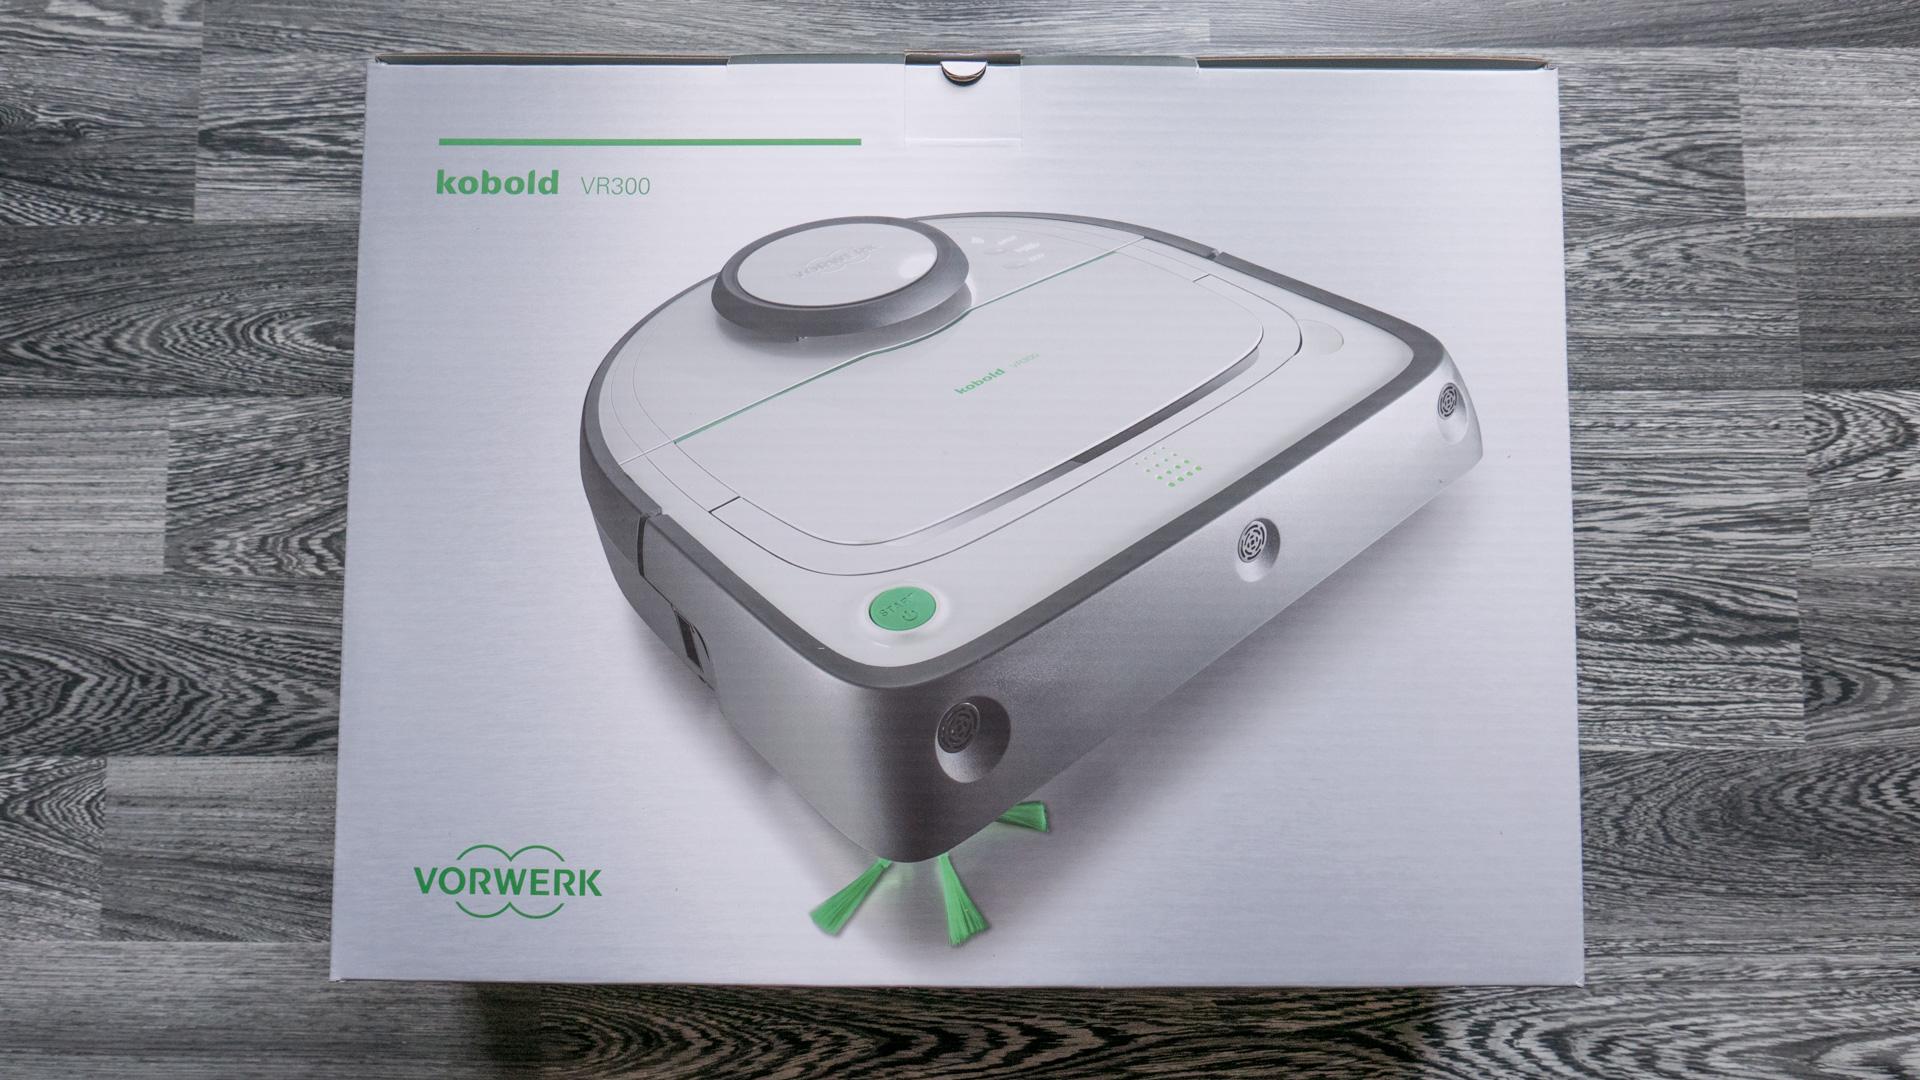 Vorwerk-VR300-Unboxing-4